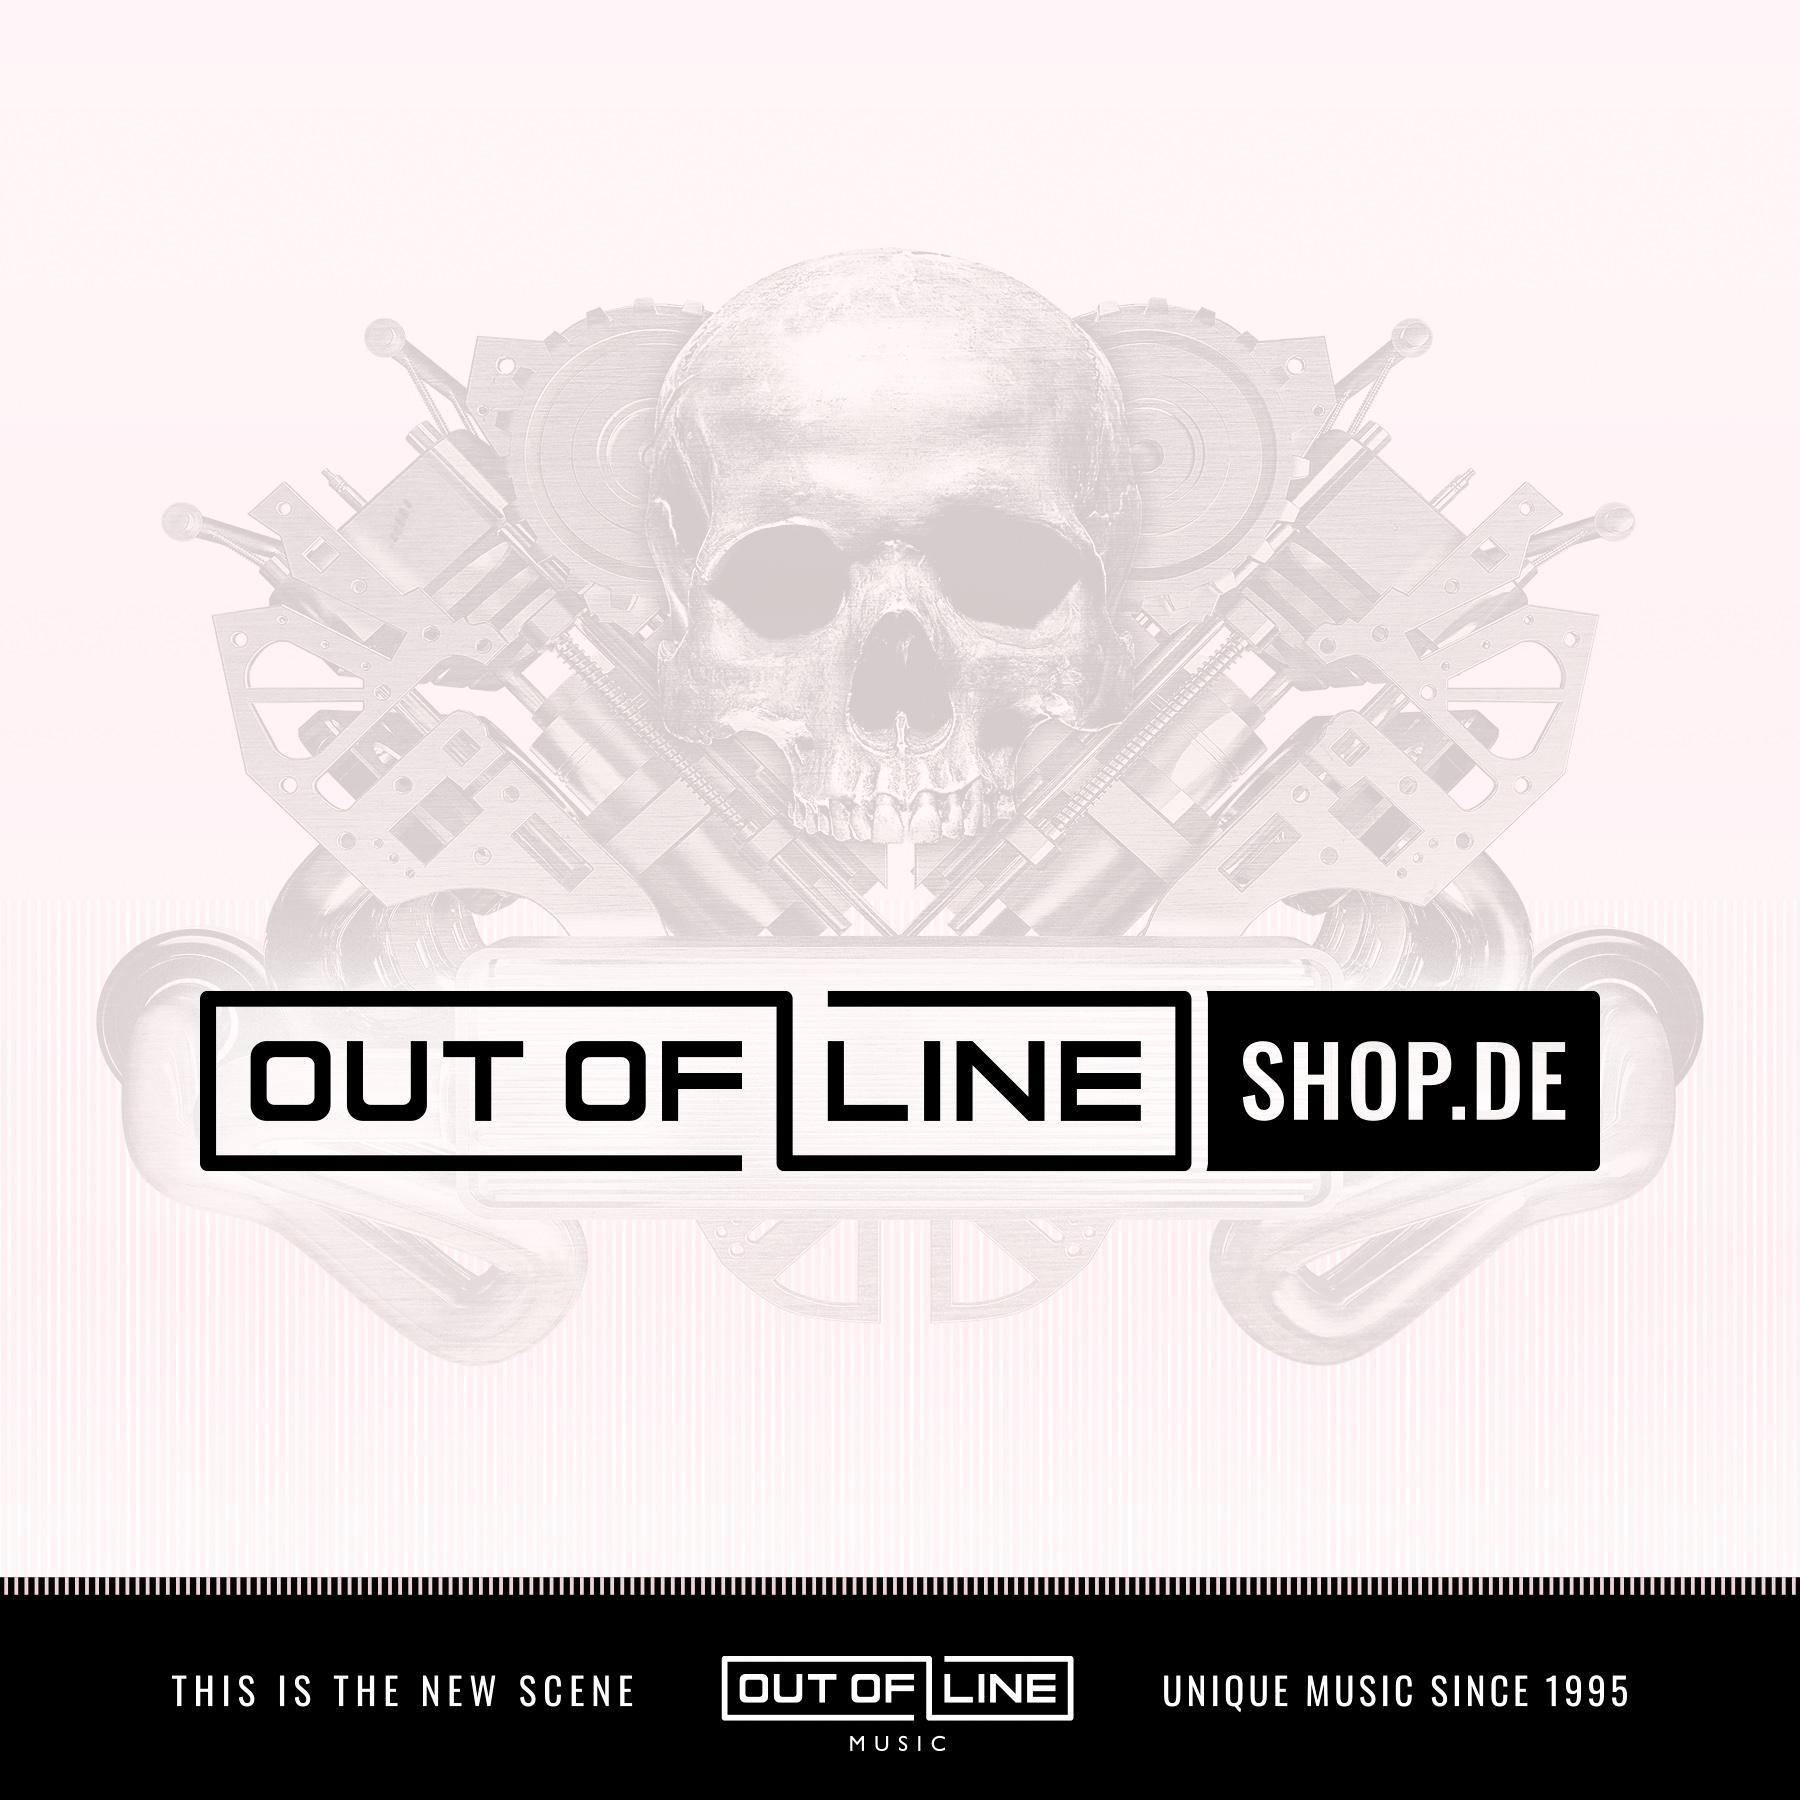 Leaves' Eyes - The Last Viking (Ltd.Hardcover Artbook) - 2CD+DVD